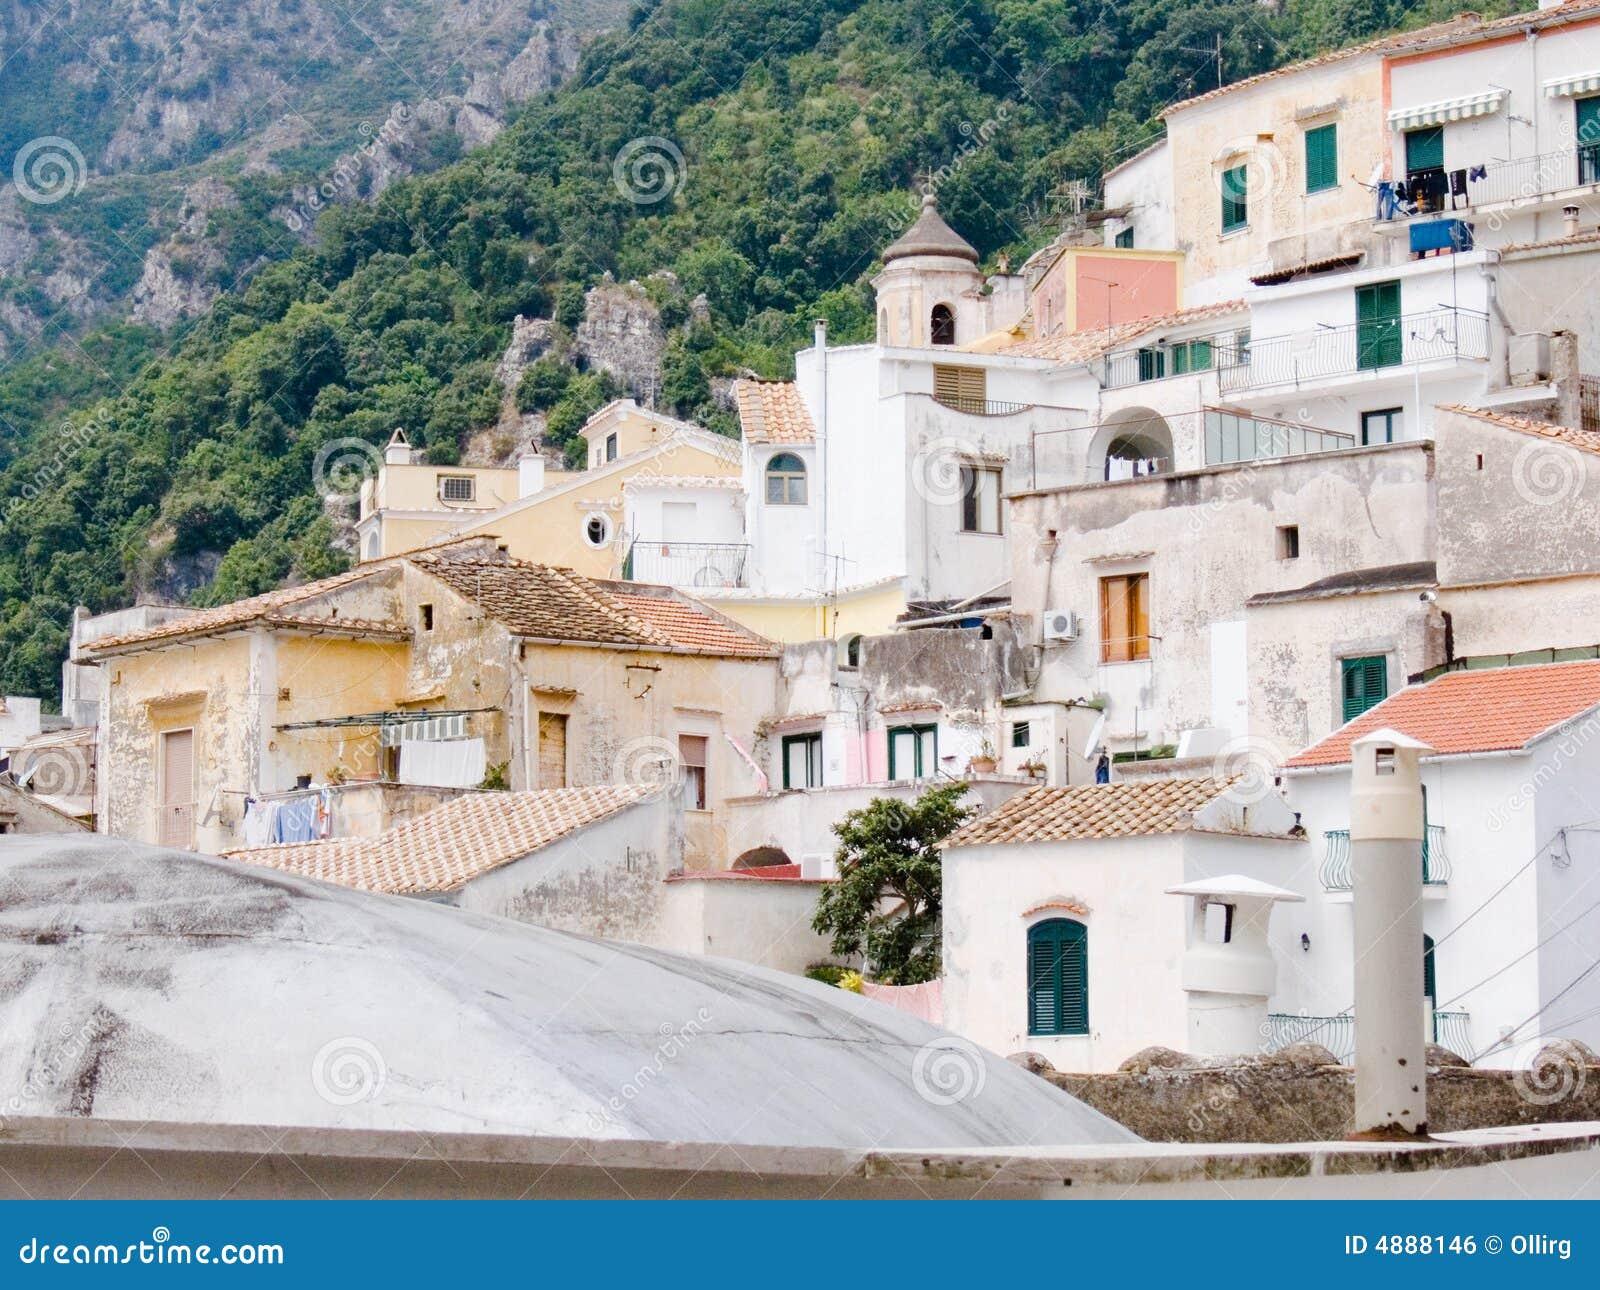 дома классик alb landscape среднеземноморское